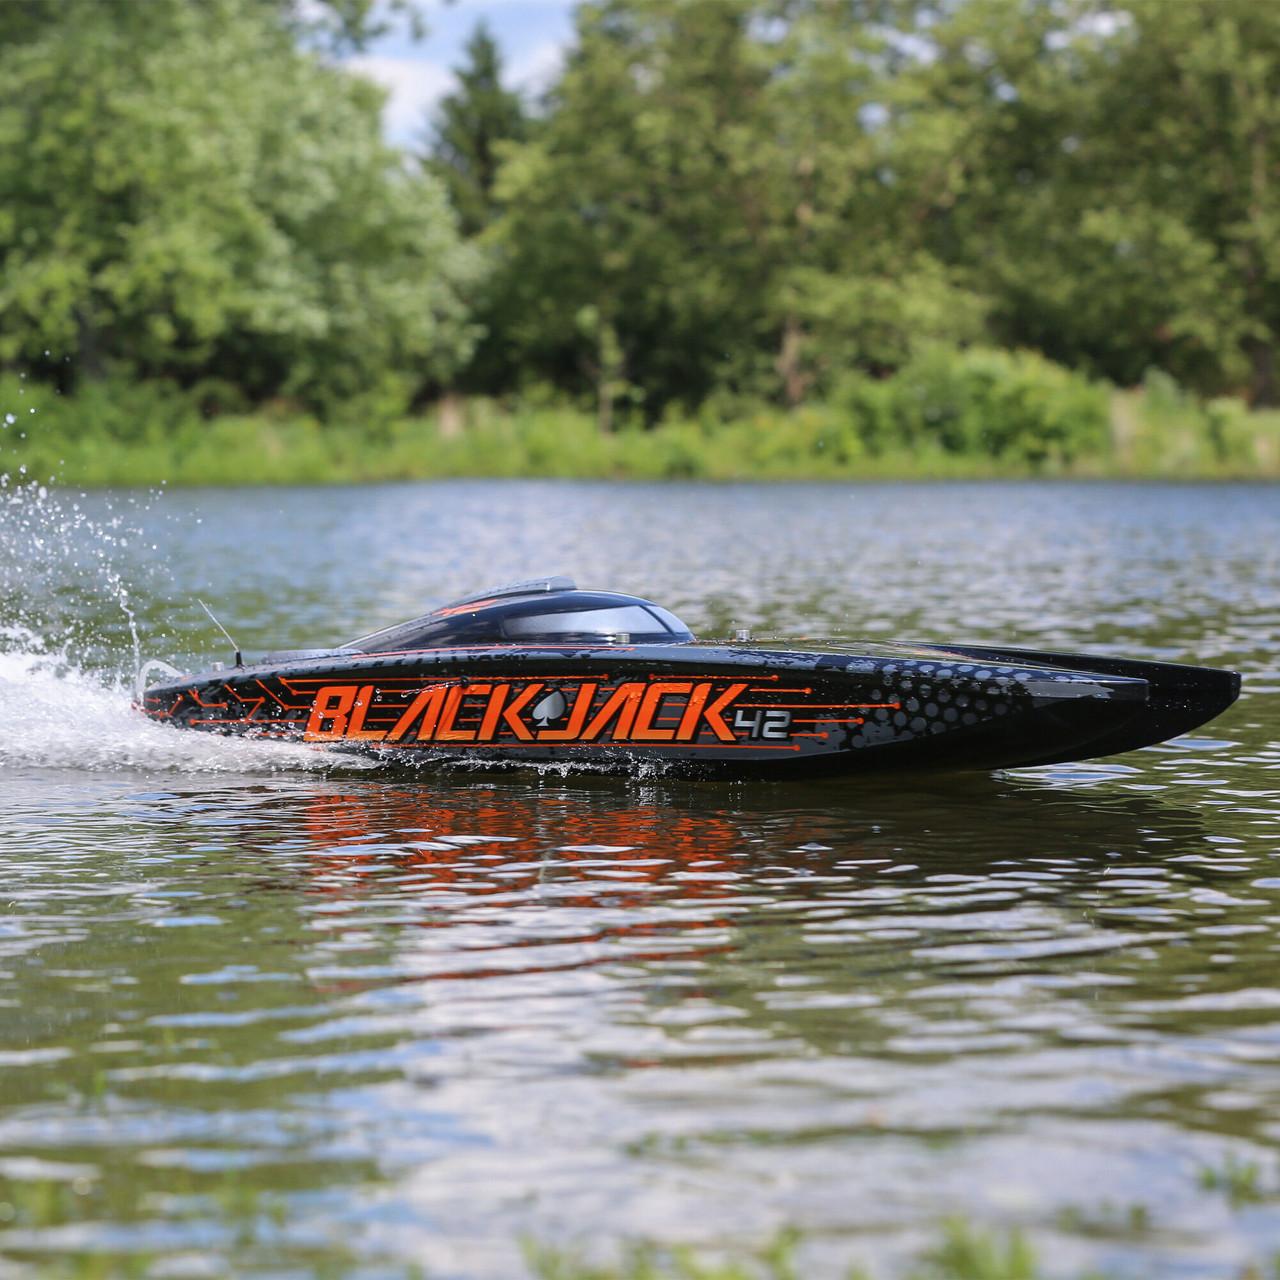 "Pro Boat Blackjack 42"" 8S Brushless RTR Electric Catamaran (Black/Orange) w/2.4GHz Radio System"